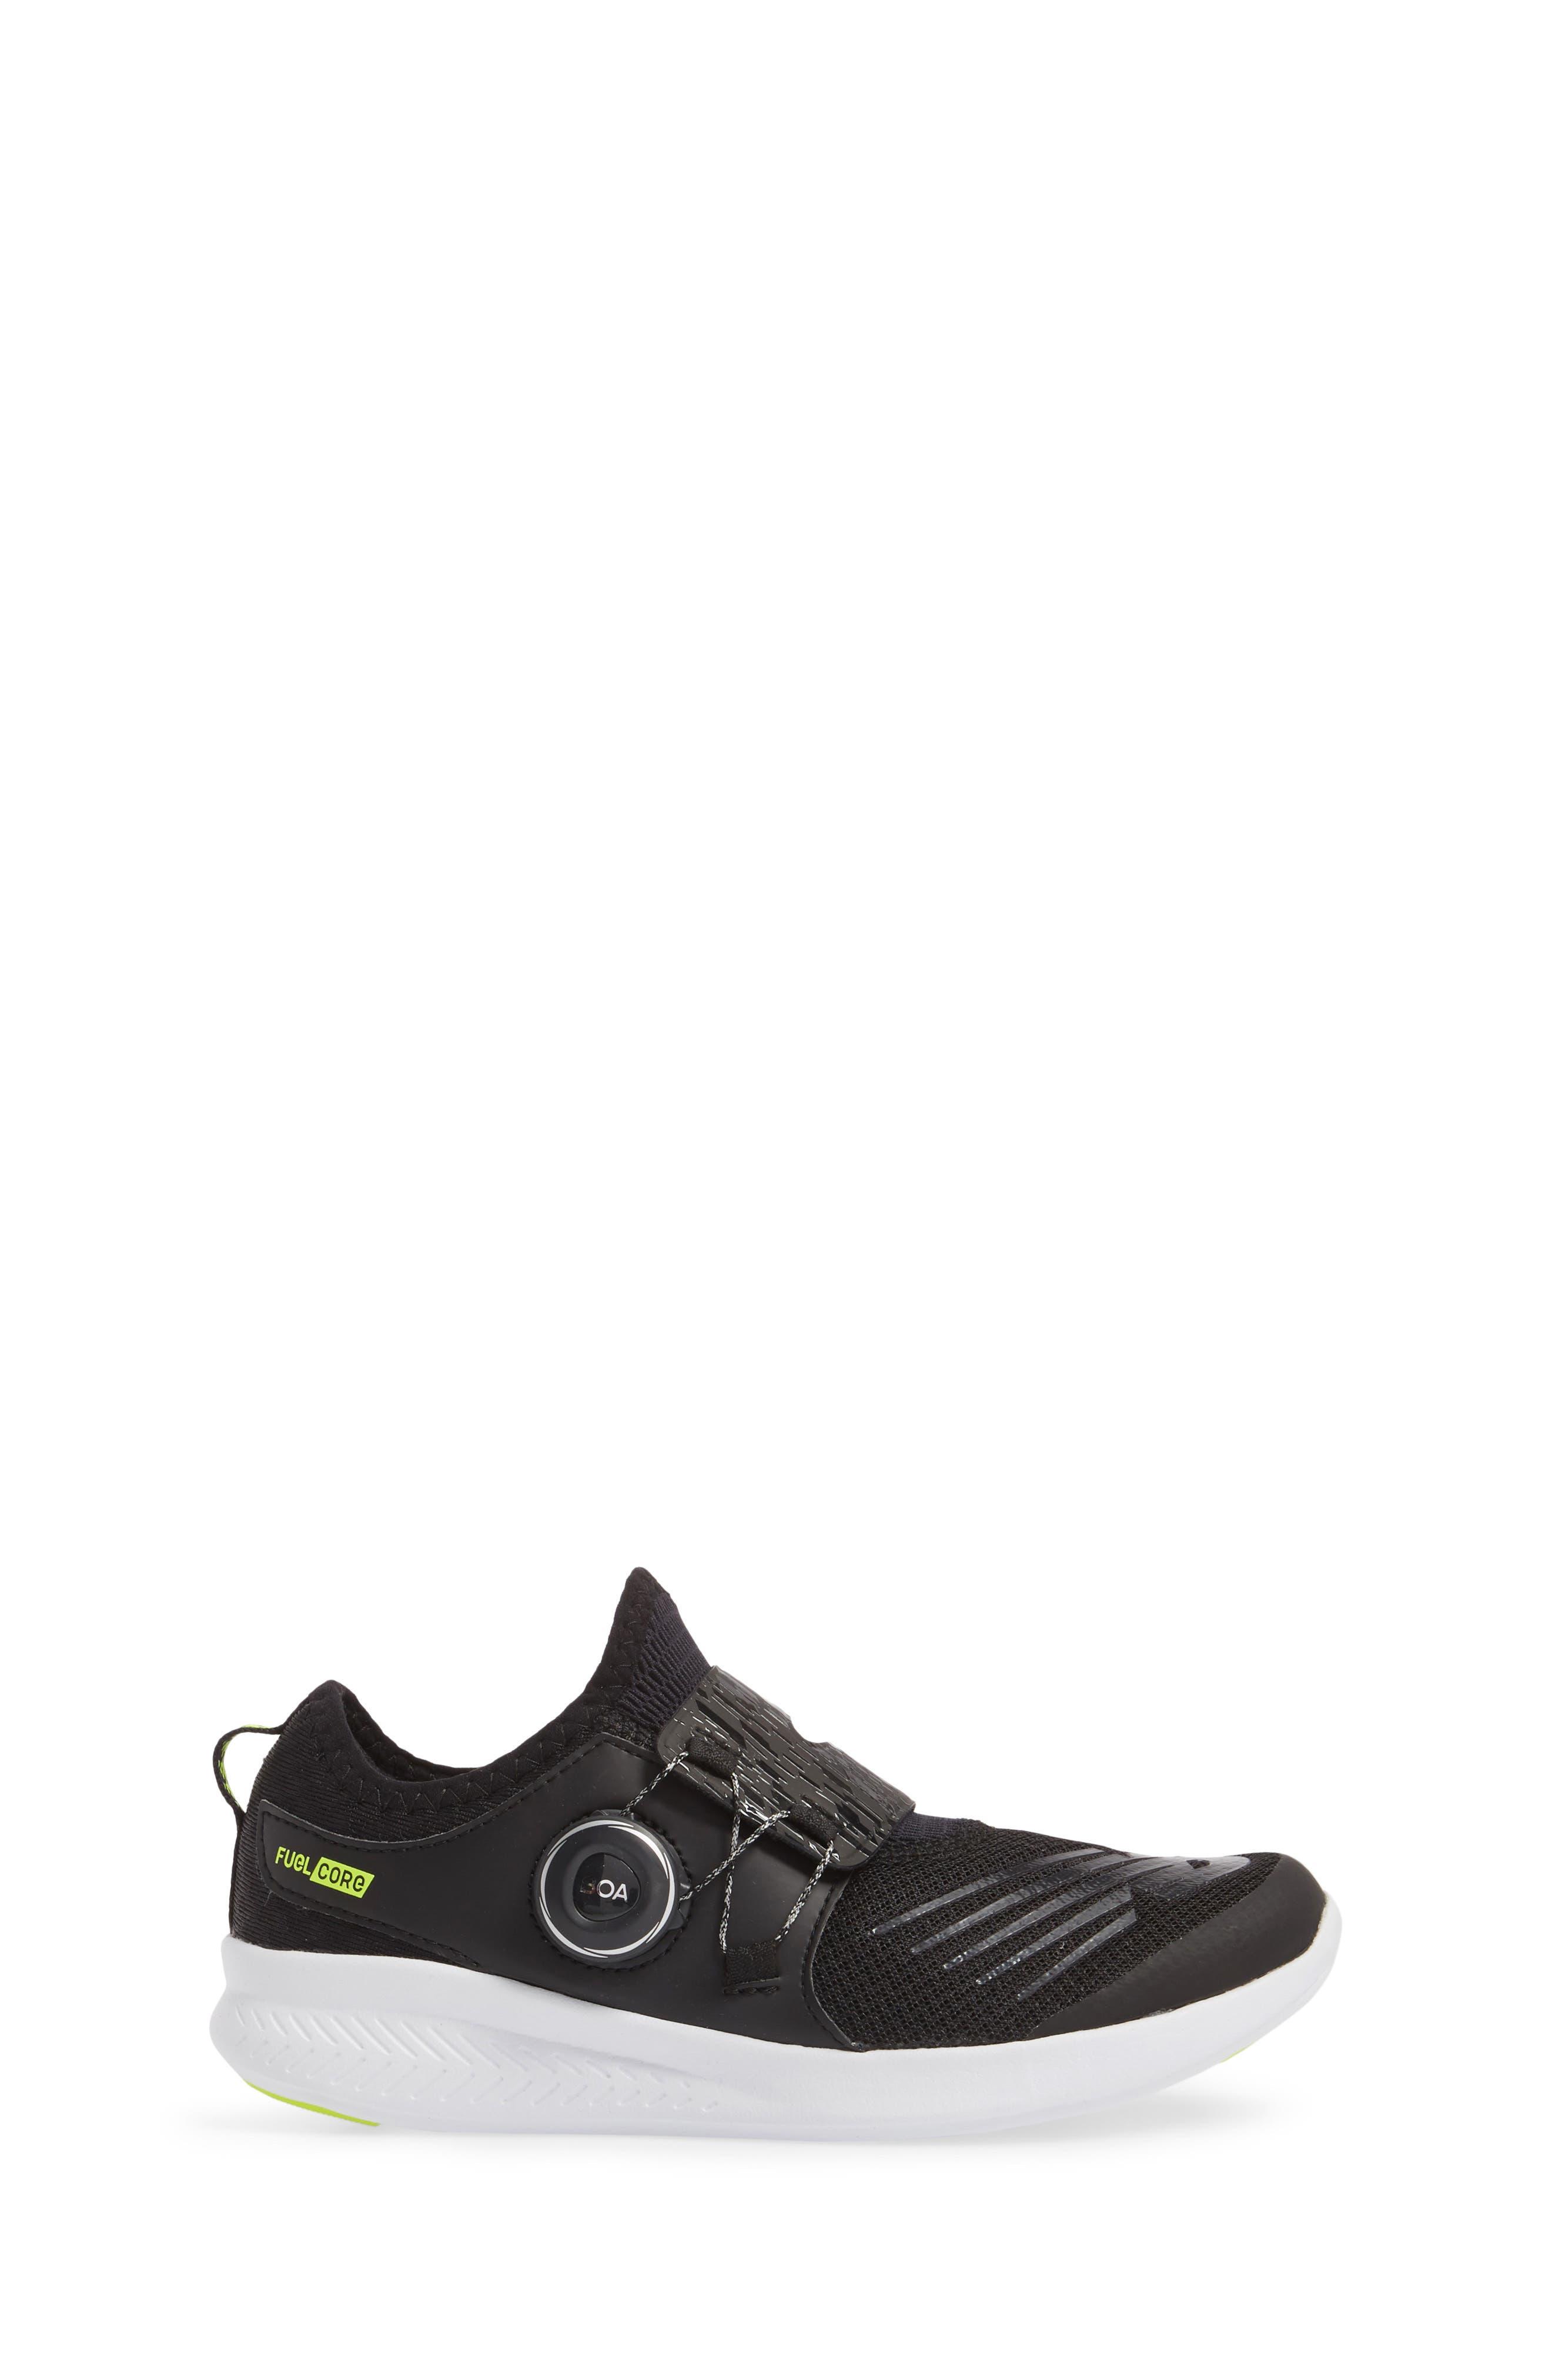 BKO Running Shoe,                             Alternate thumbnail 3, color,                             Black/ Hi Lite